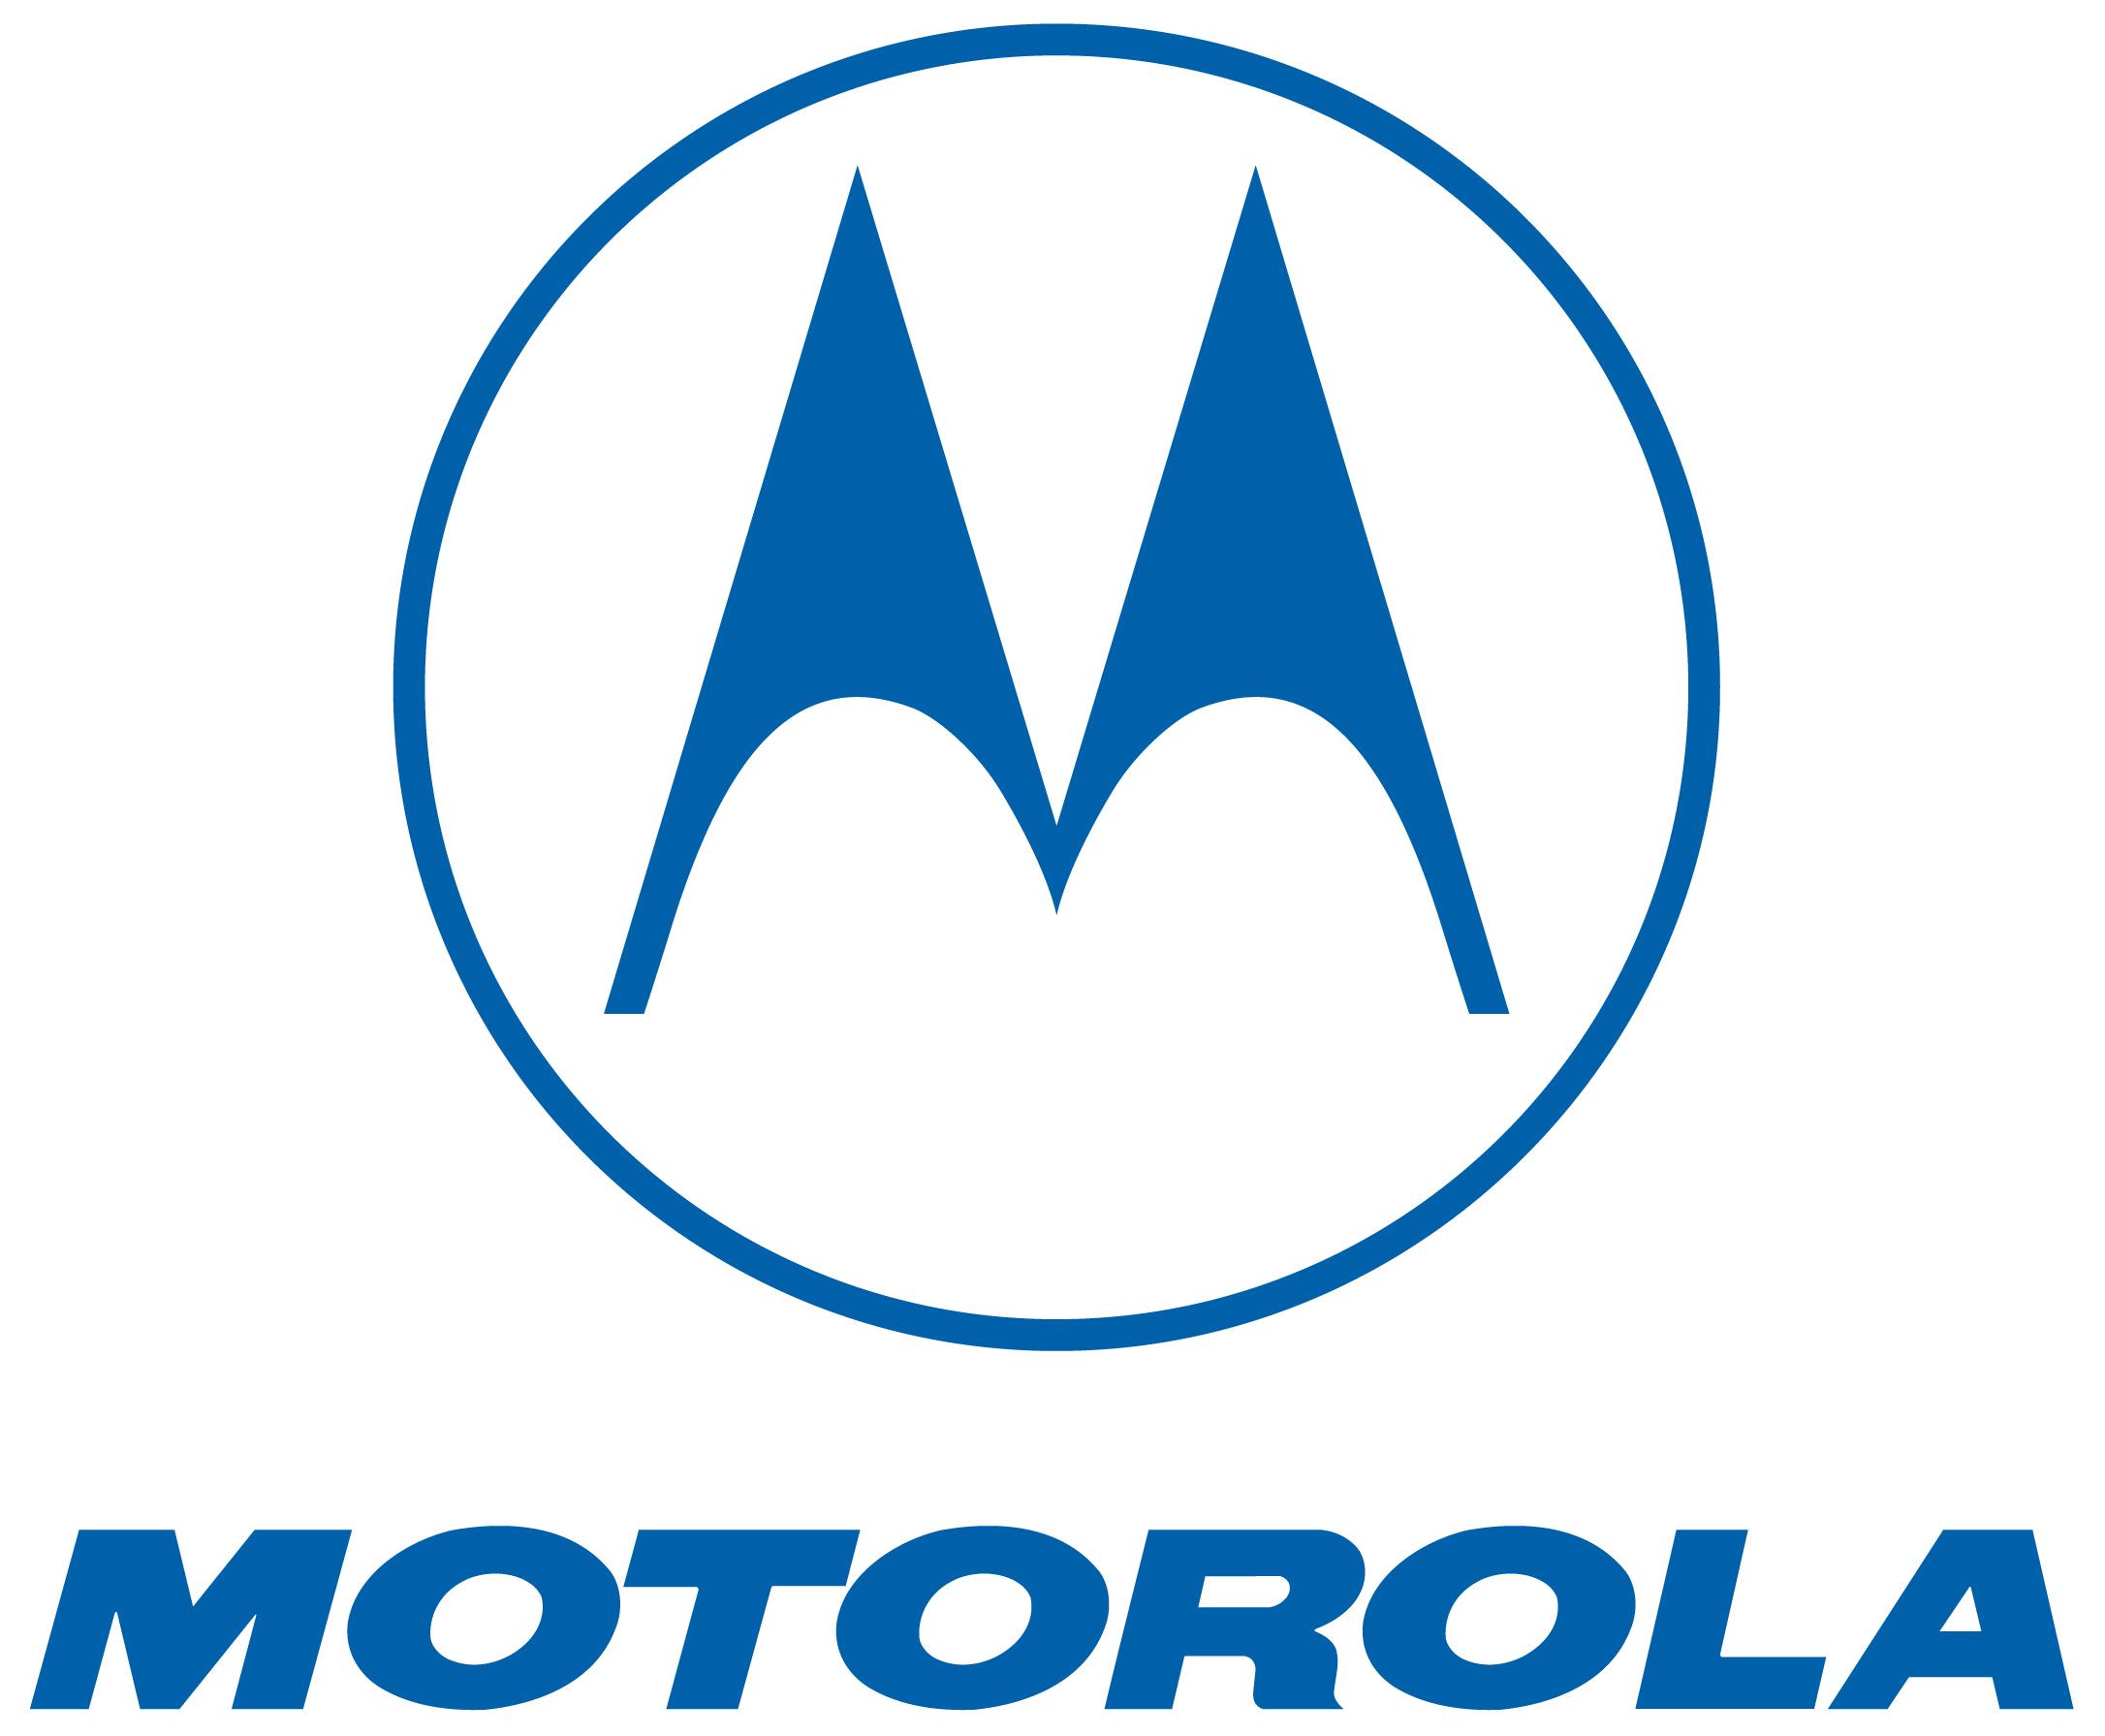 Motorola brand wallpapers HD